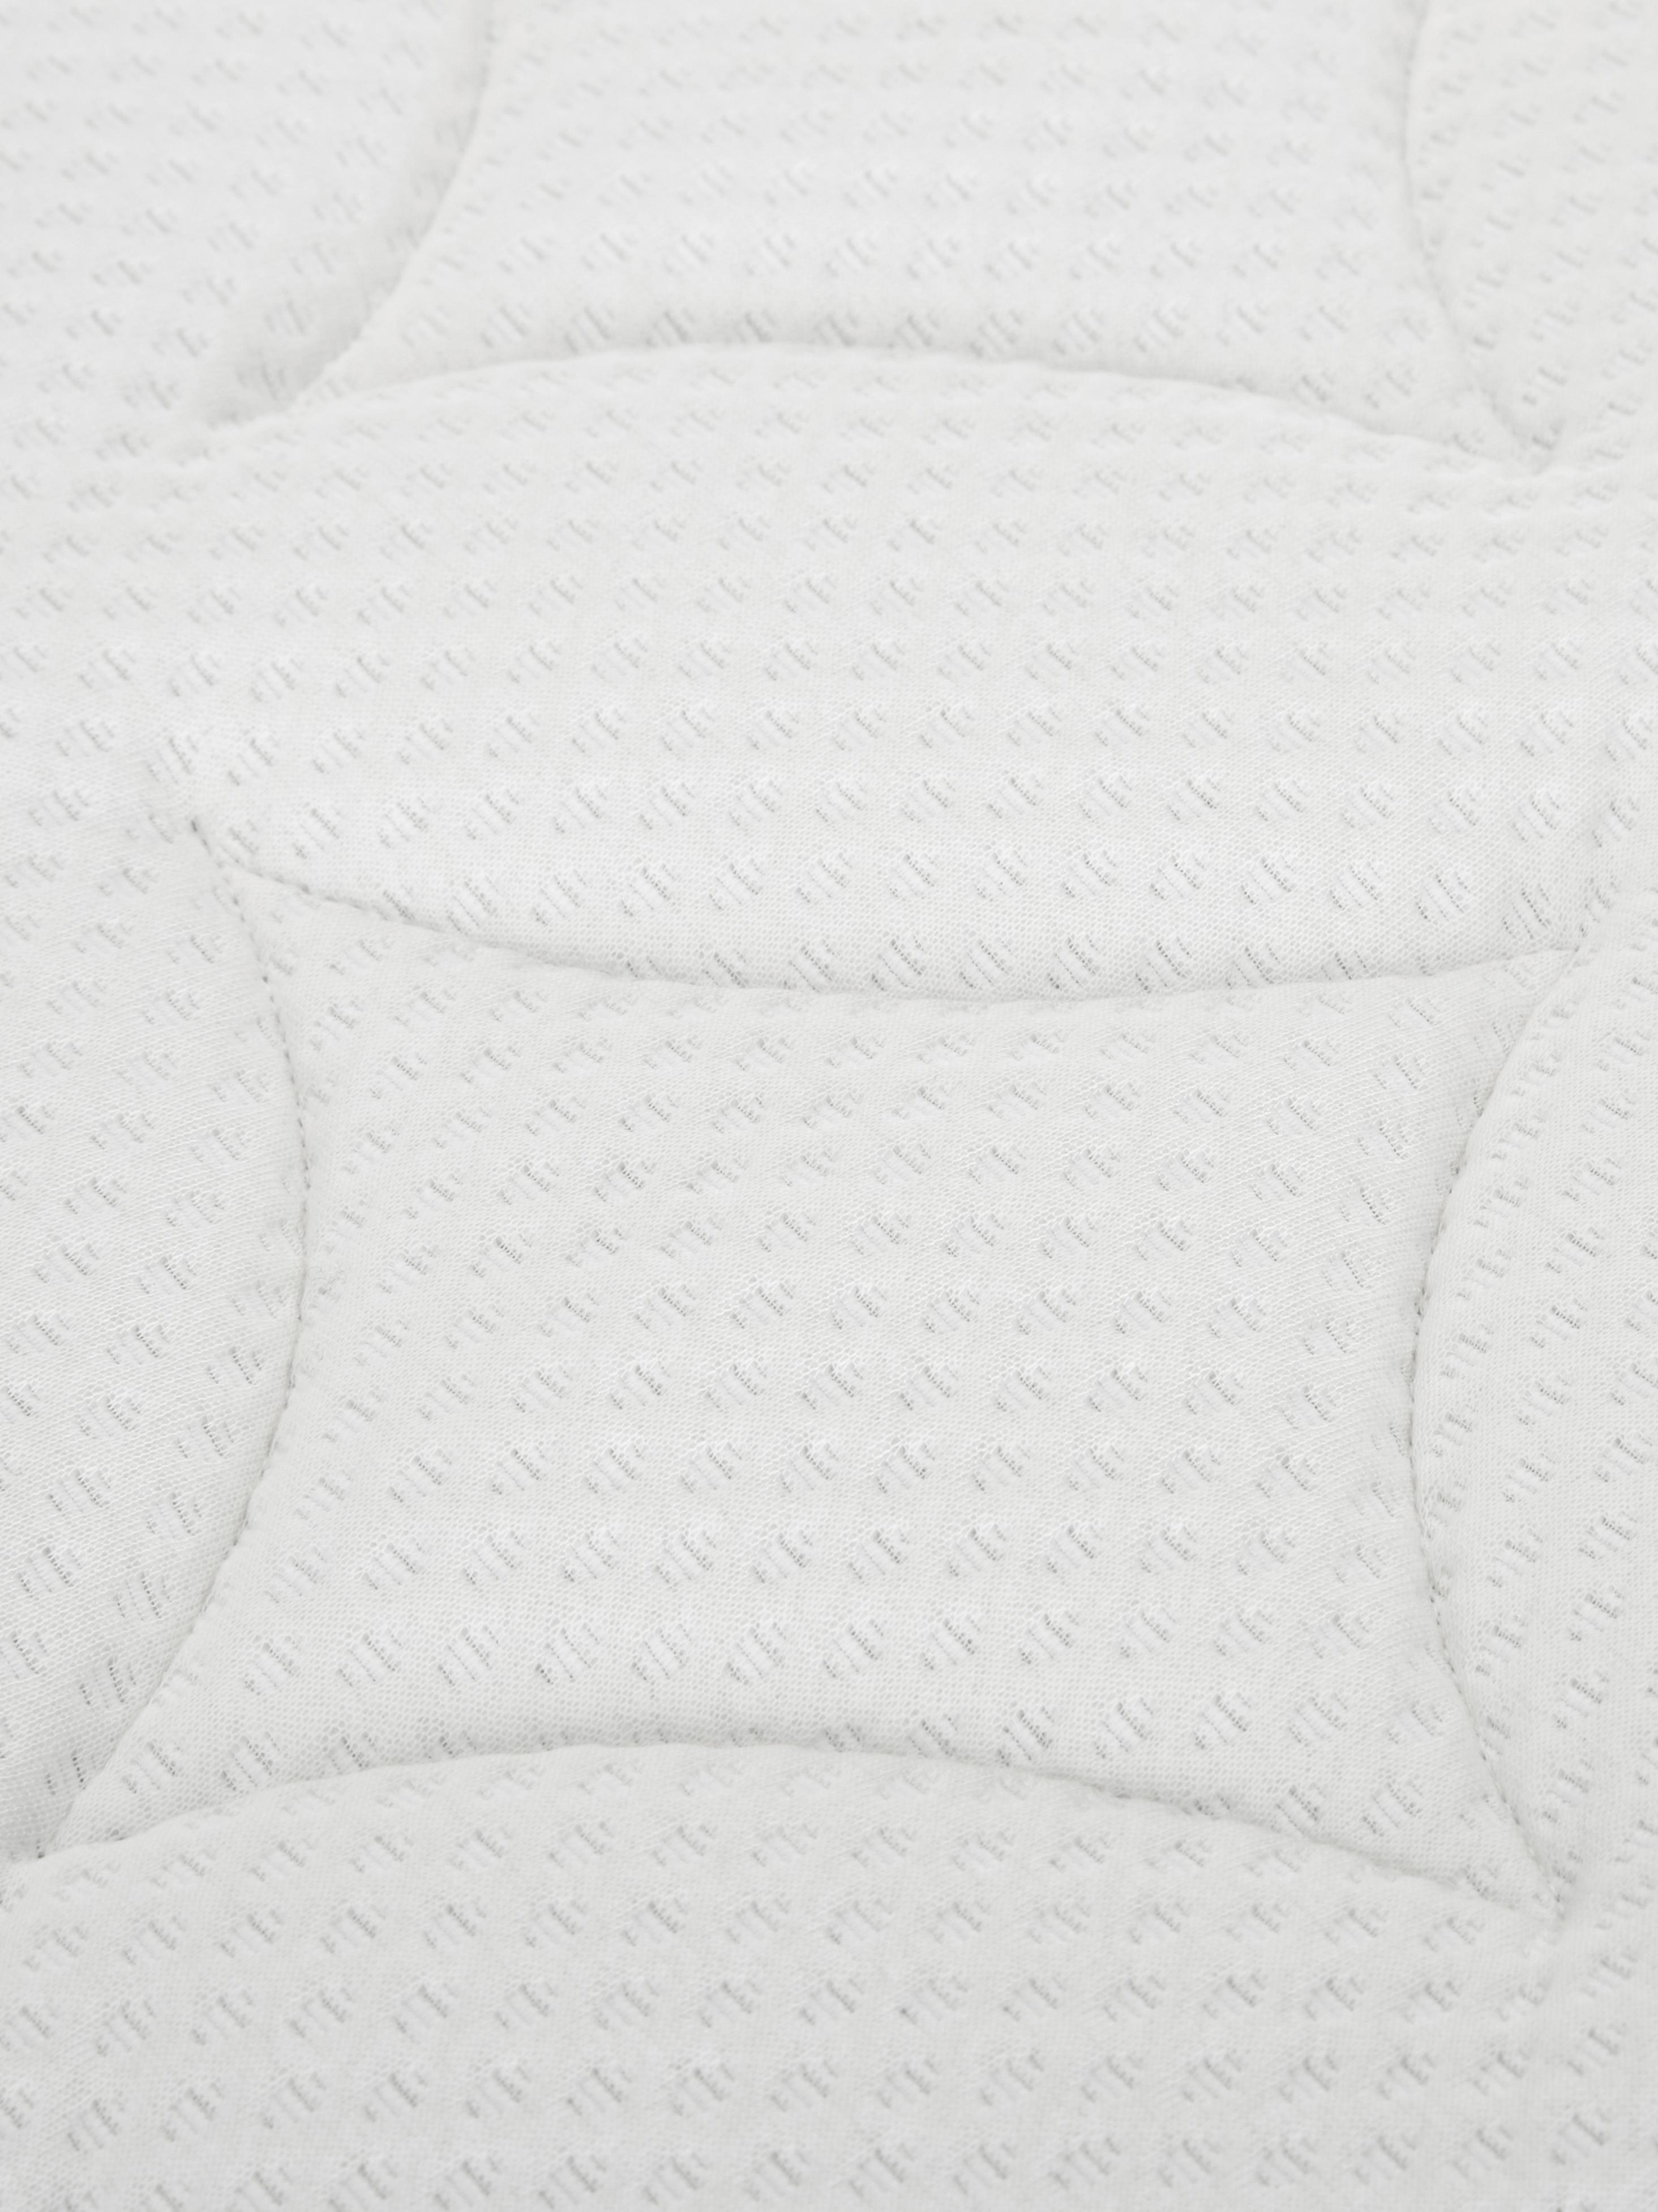 Premium Samt-Boxspringbett Phoebe, Matratze: 7-Zonen-Taschenfederkern , Füße: Massives Buchenholz, lack, Hellgrau, 200 x 200 cm